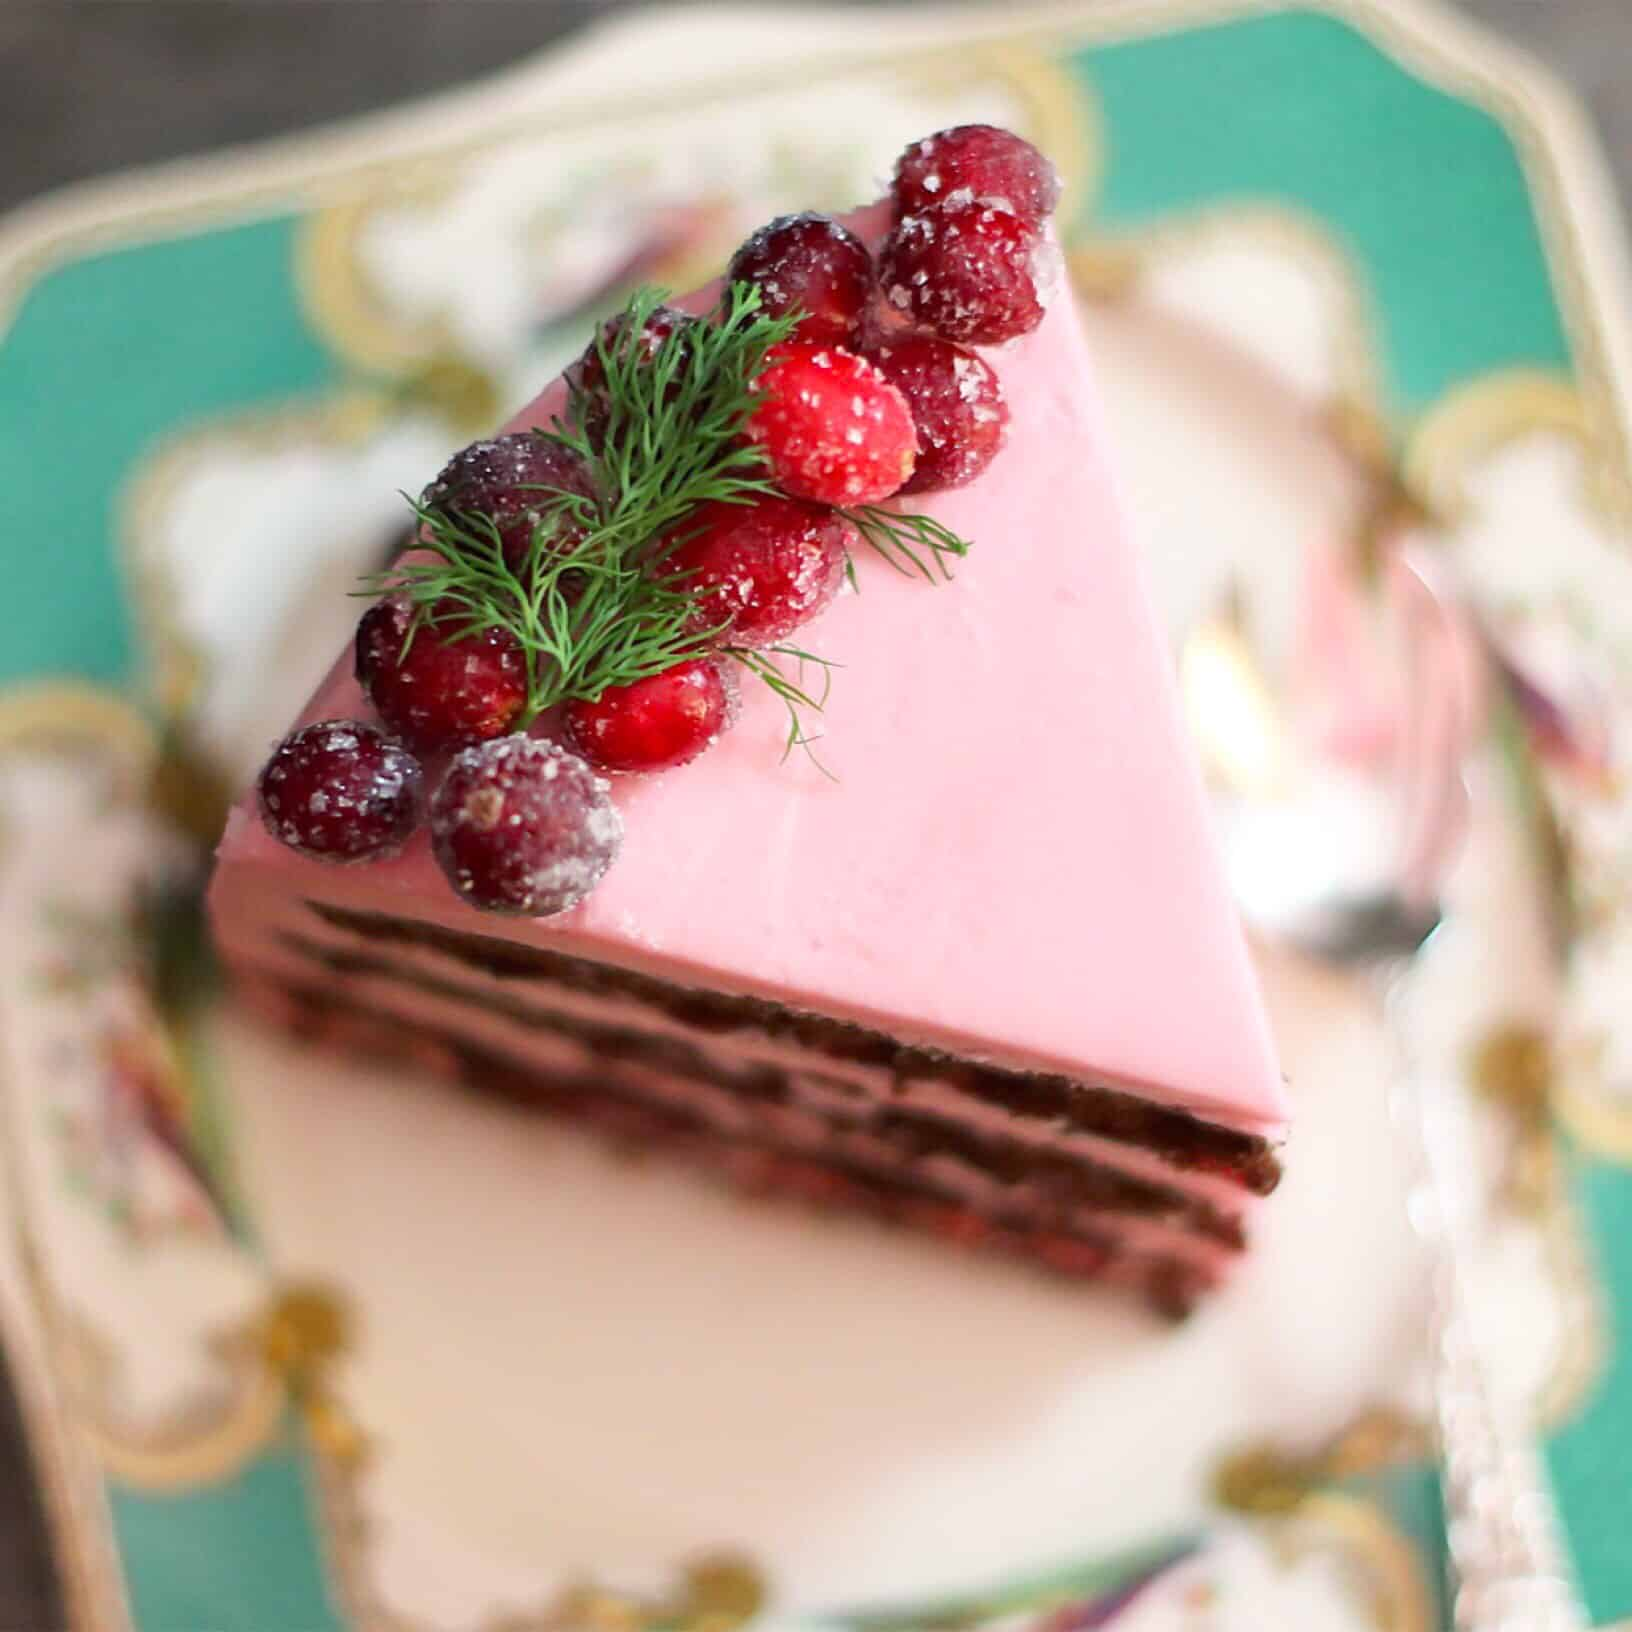 GF Choc Cran Cherry Cake dreamy